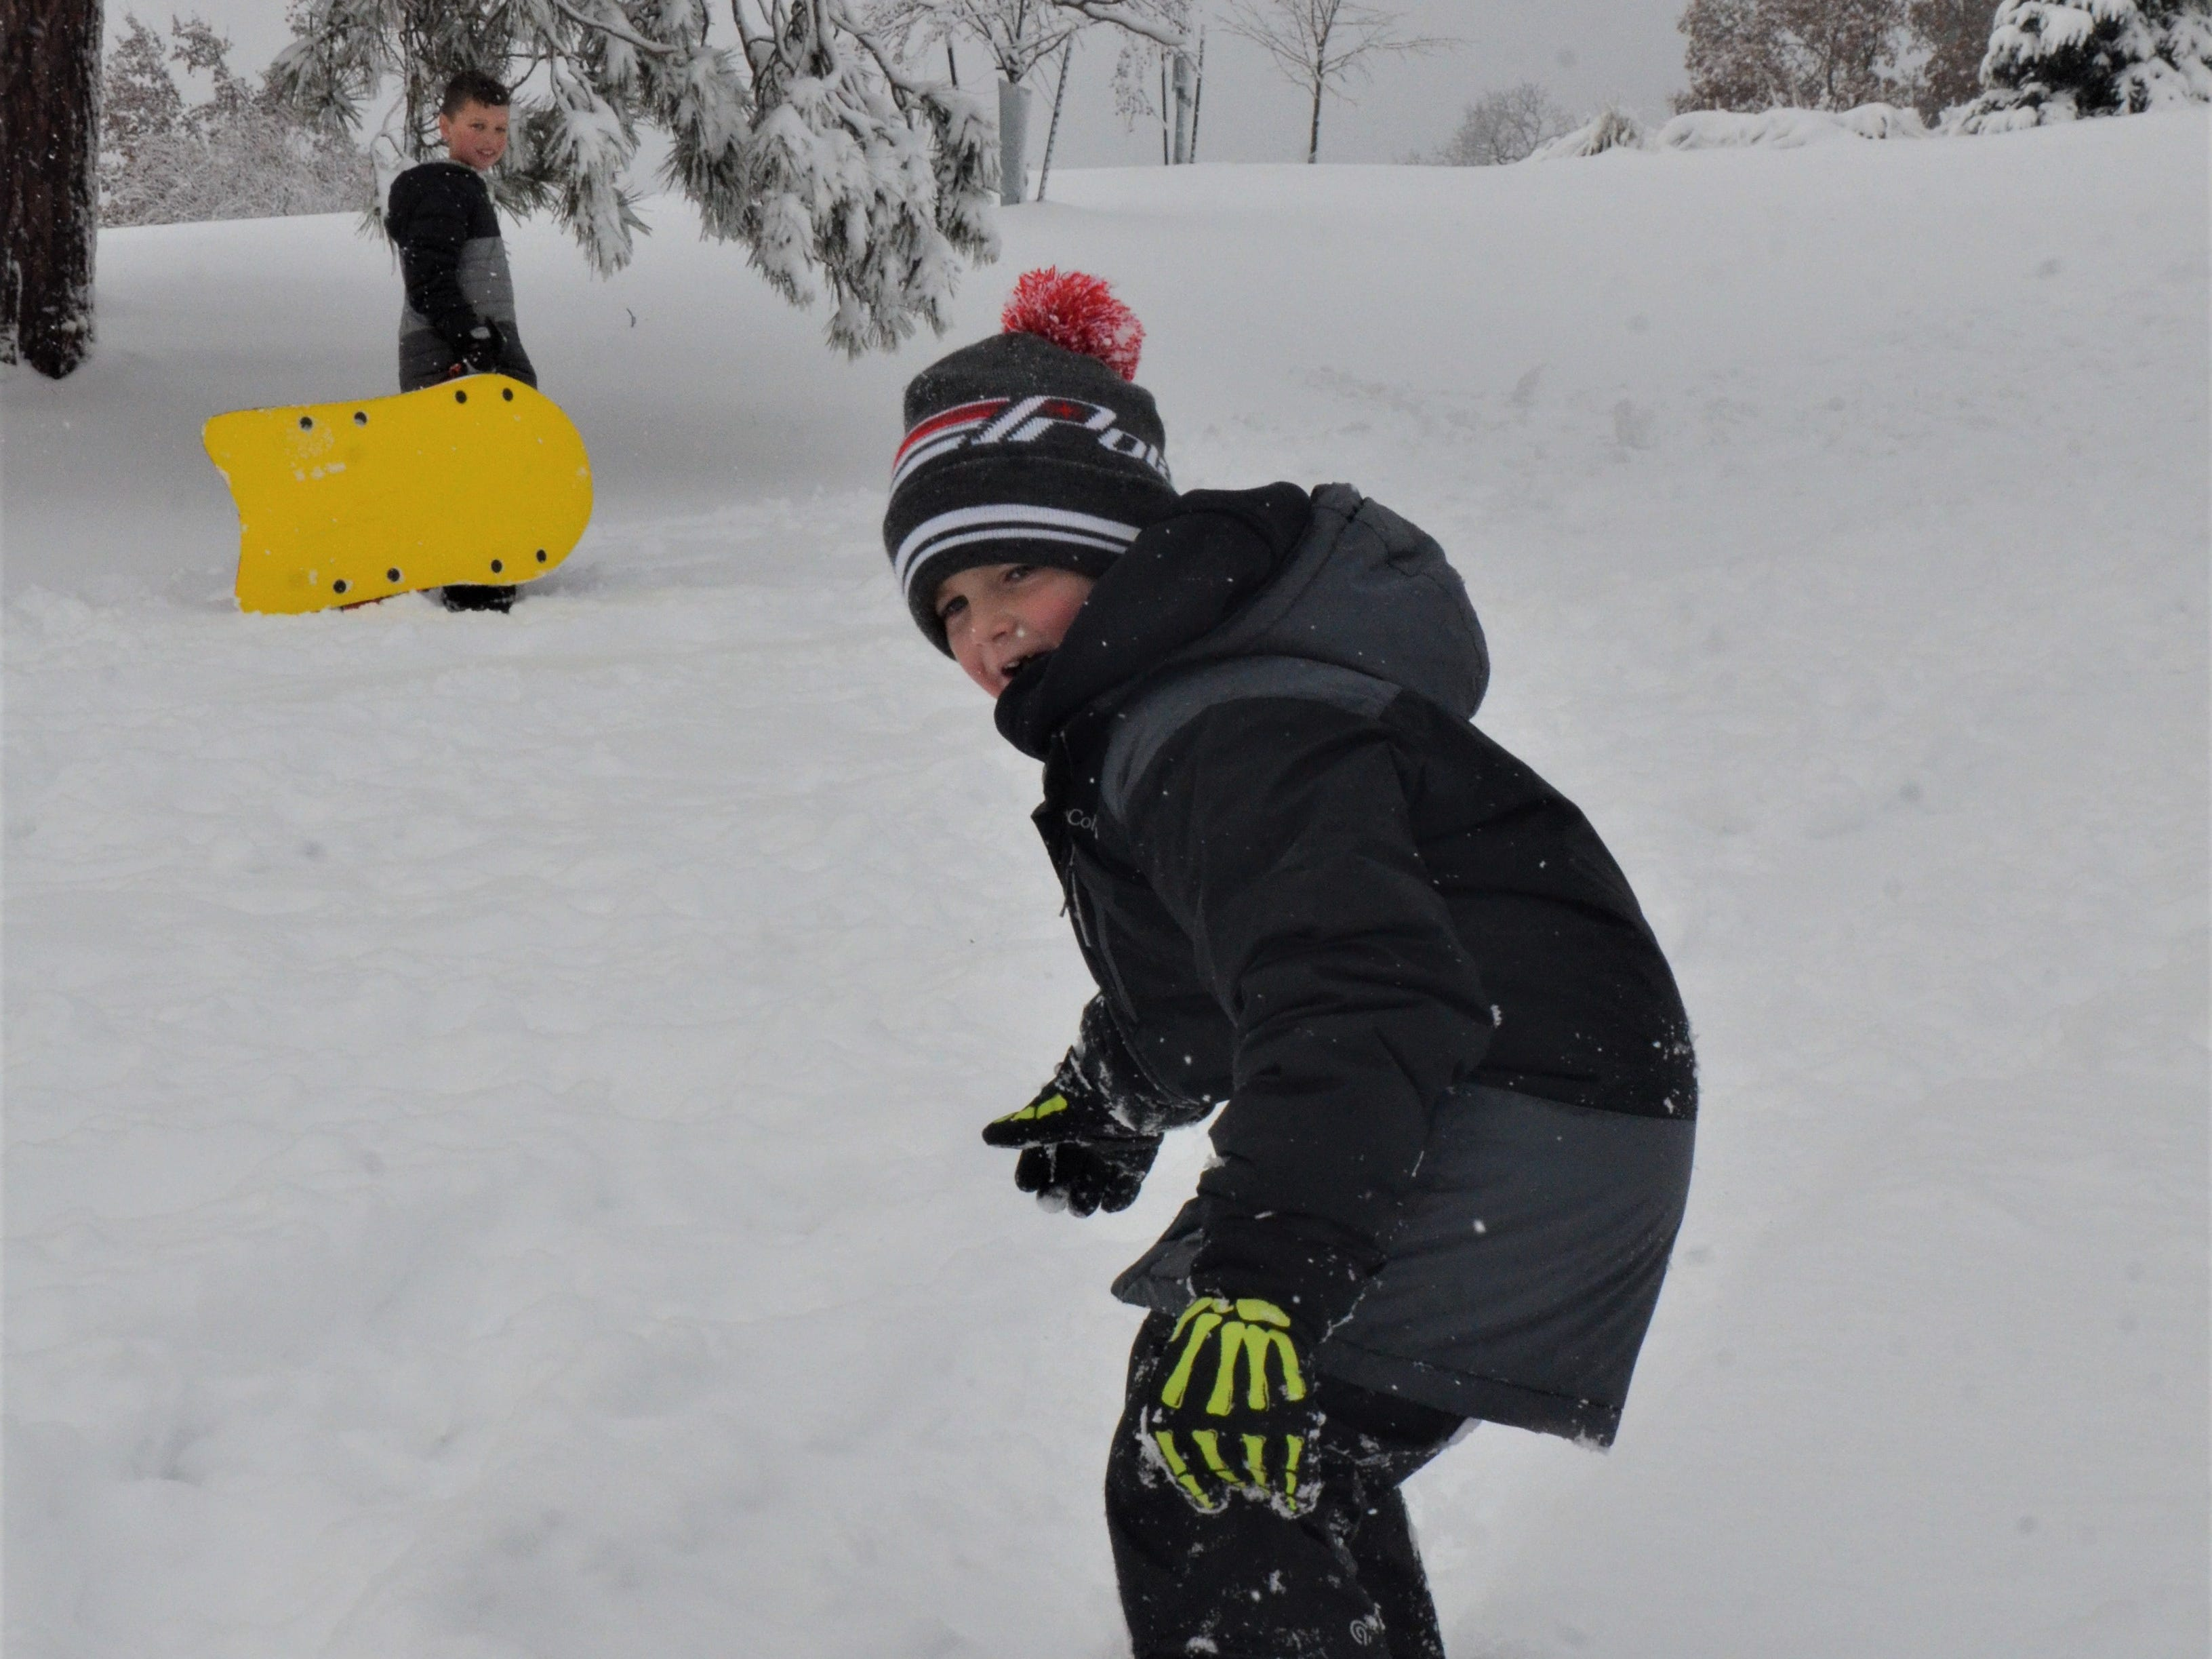 Landon Bennett, 8, rides his snowboard down the hill at Leila Arboretum on Monday, November 26. 2018.